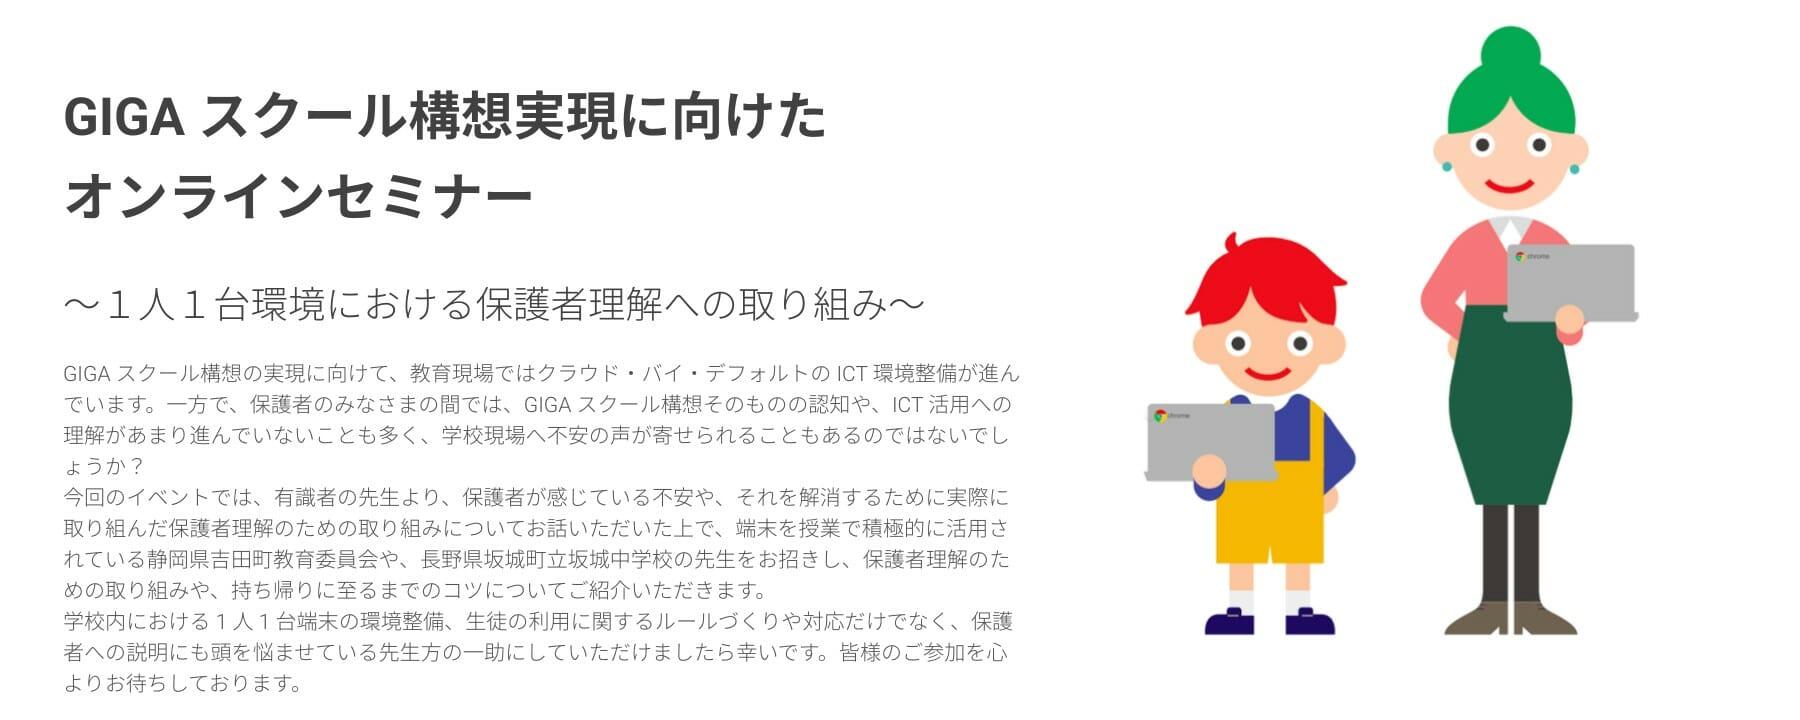 [Google for Education] GIGA スクール構想実現に向けたオンラインセミナー 〜 1 人 1 台環境における保護者理解への取り組み〜